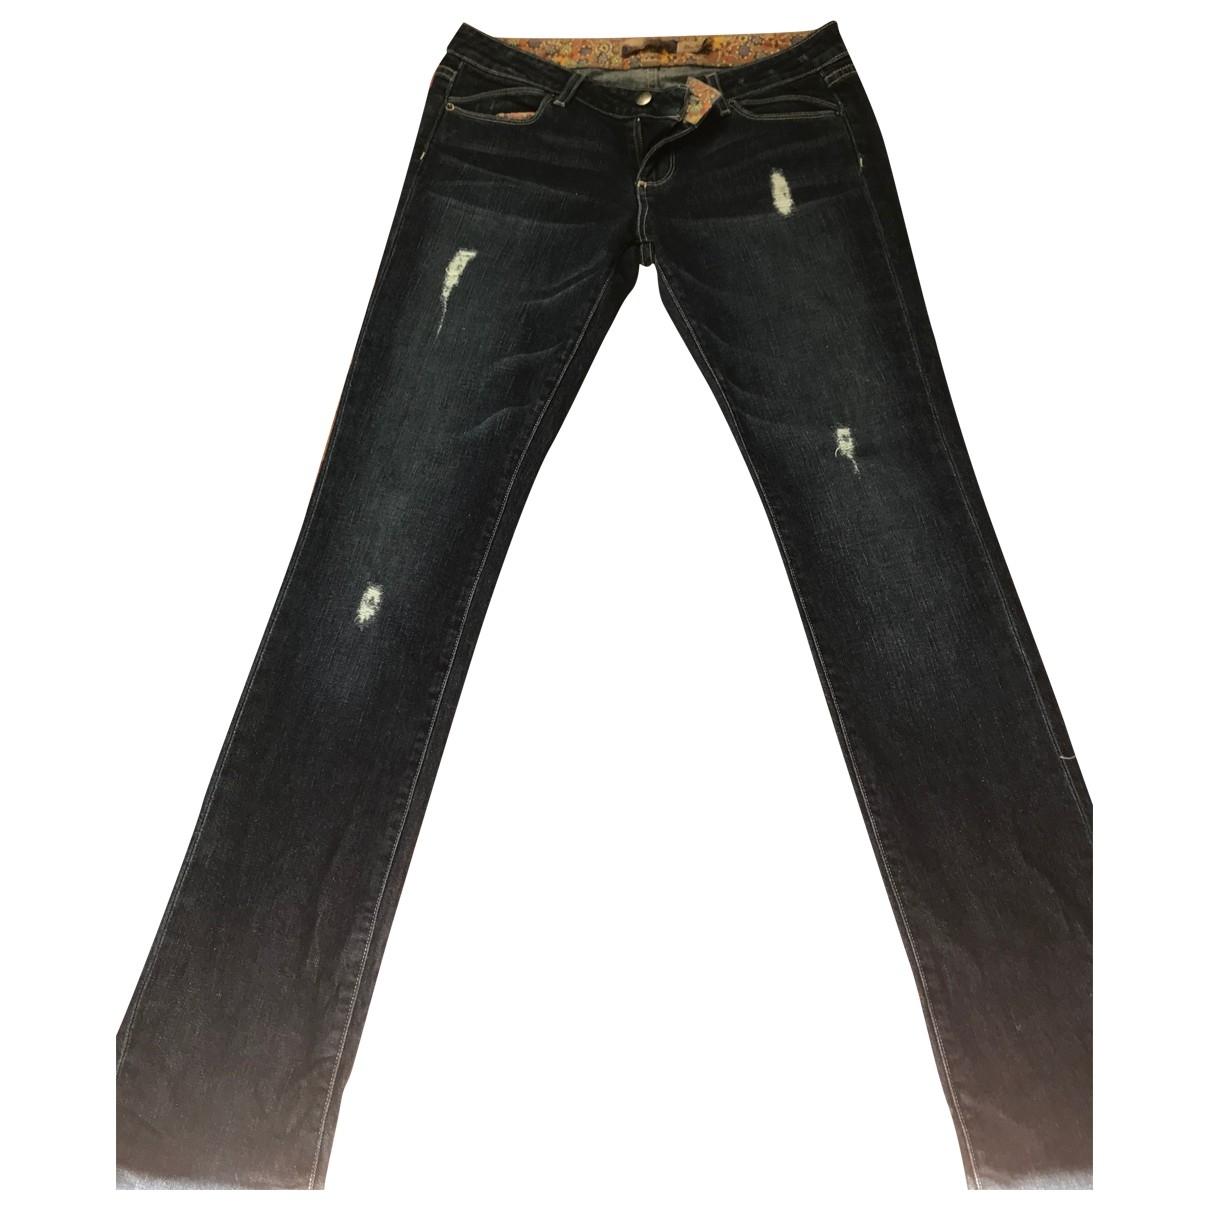 Paige Jeans \N Blue Denim - Jeans Trousers for Women 4 US